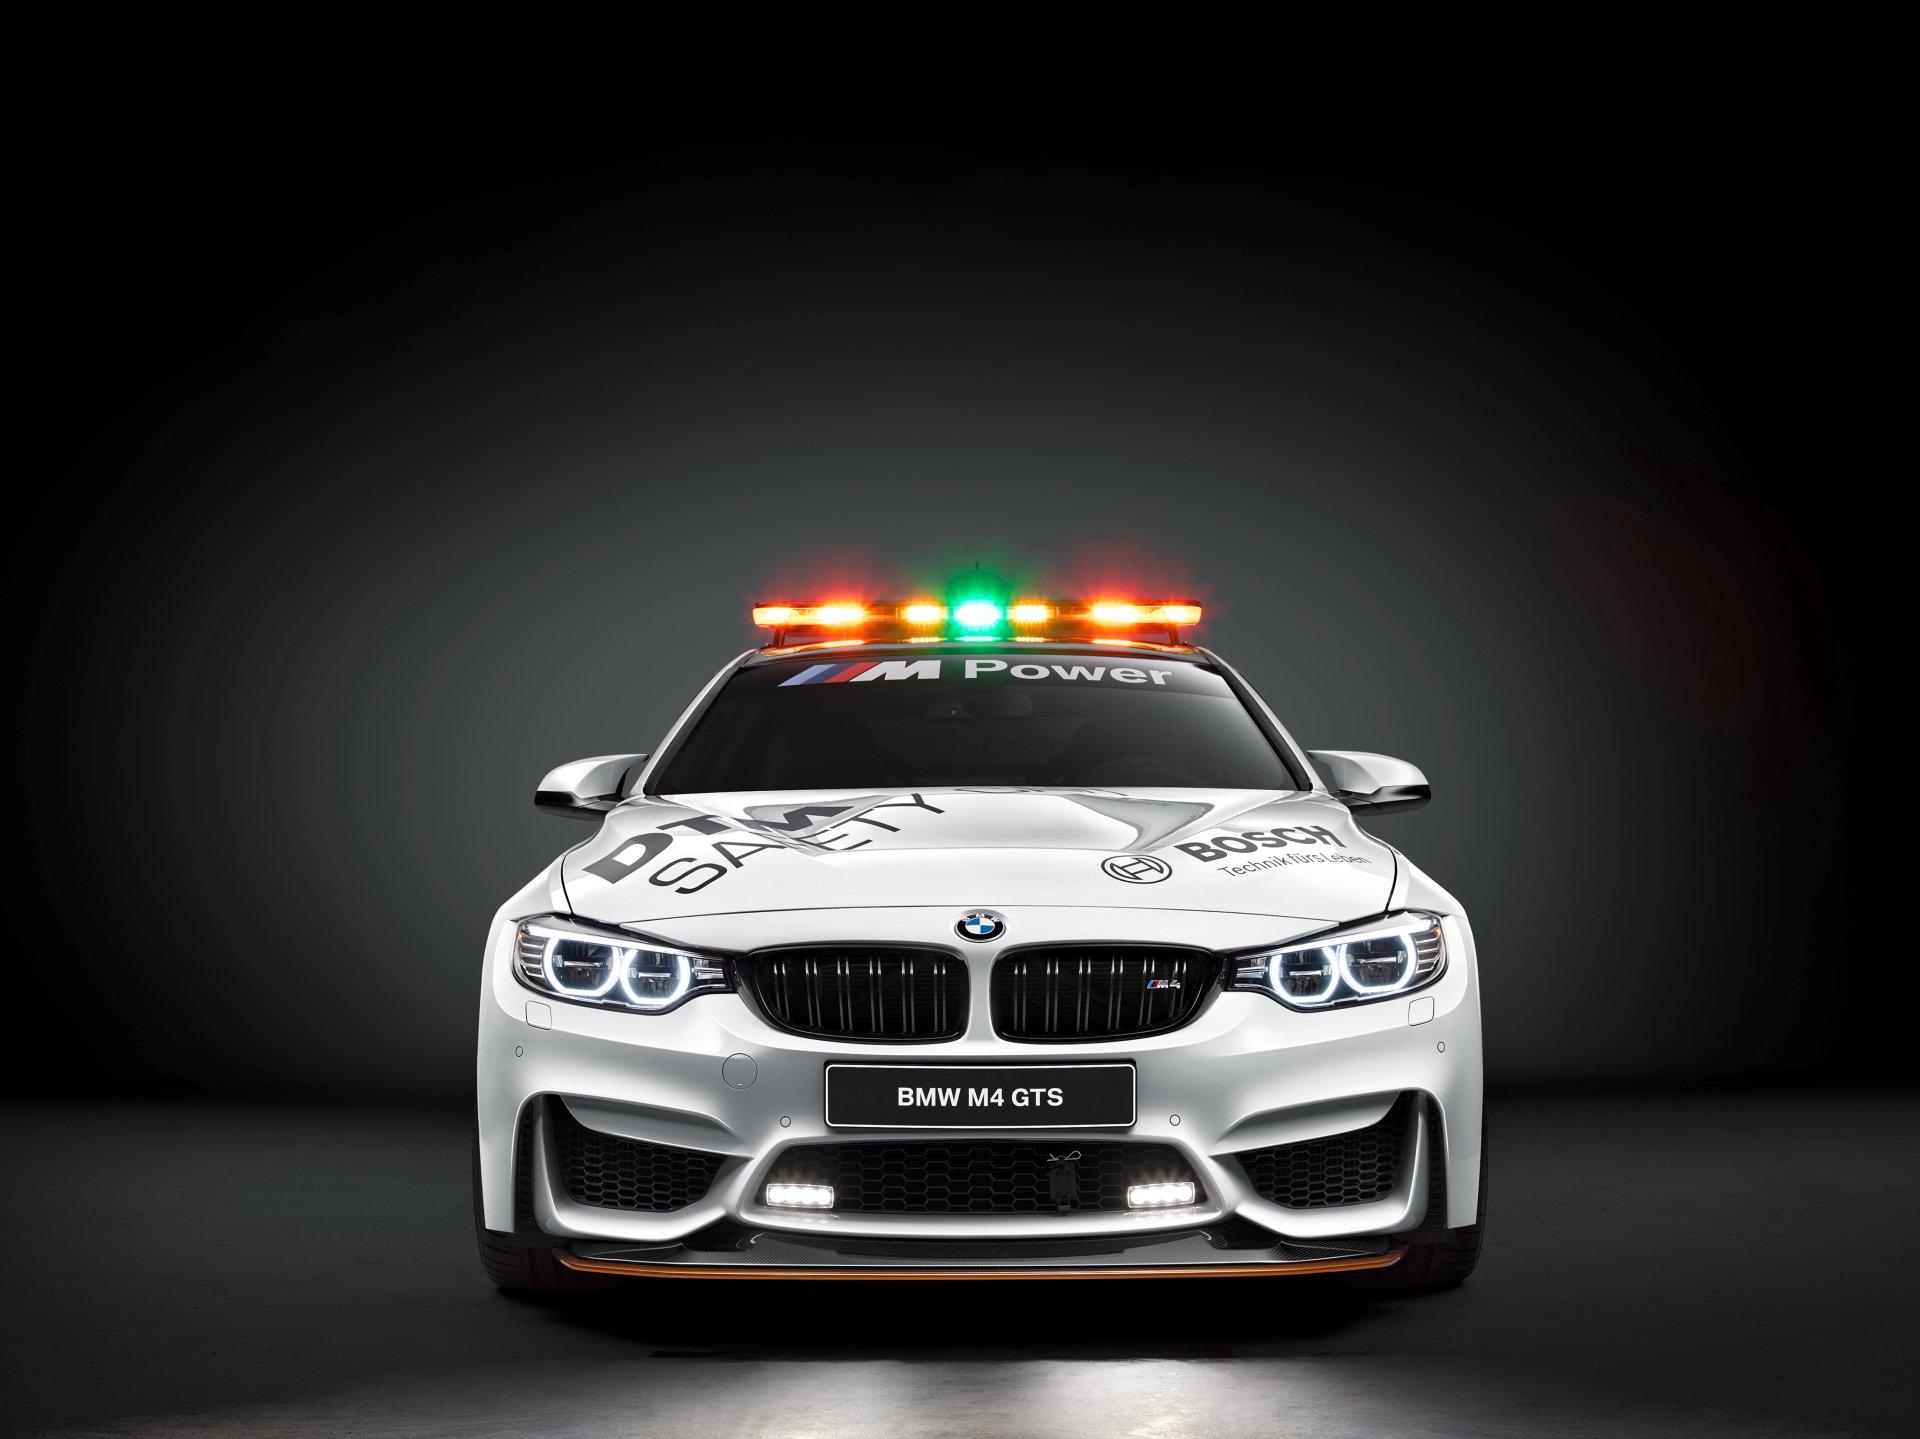 Vehicles - BMW M4  BMW M4 GTS Race Car Wallpaper